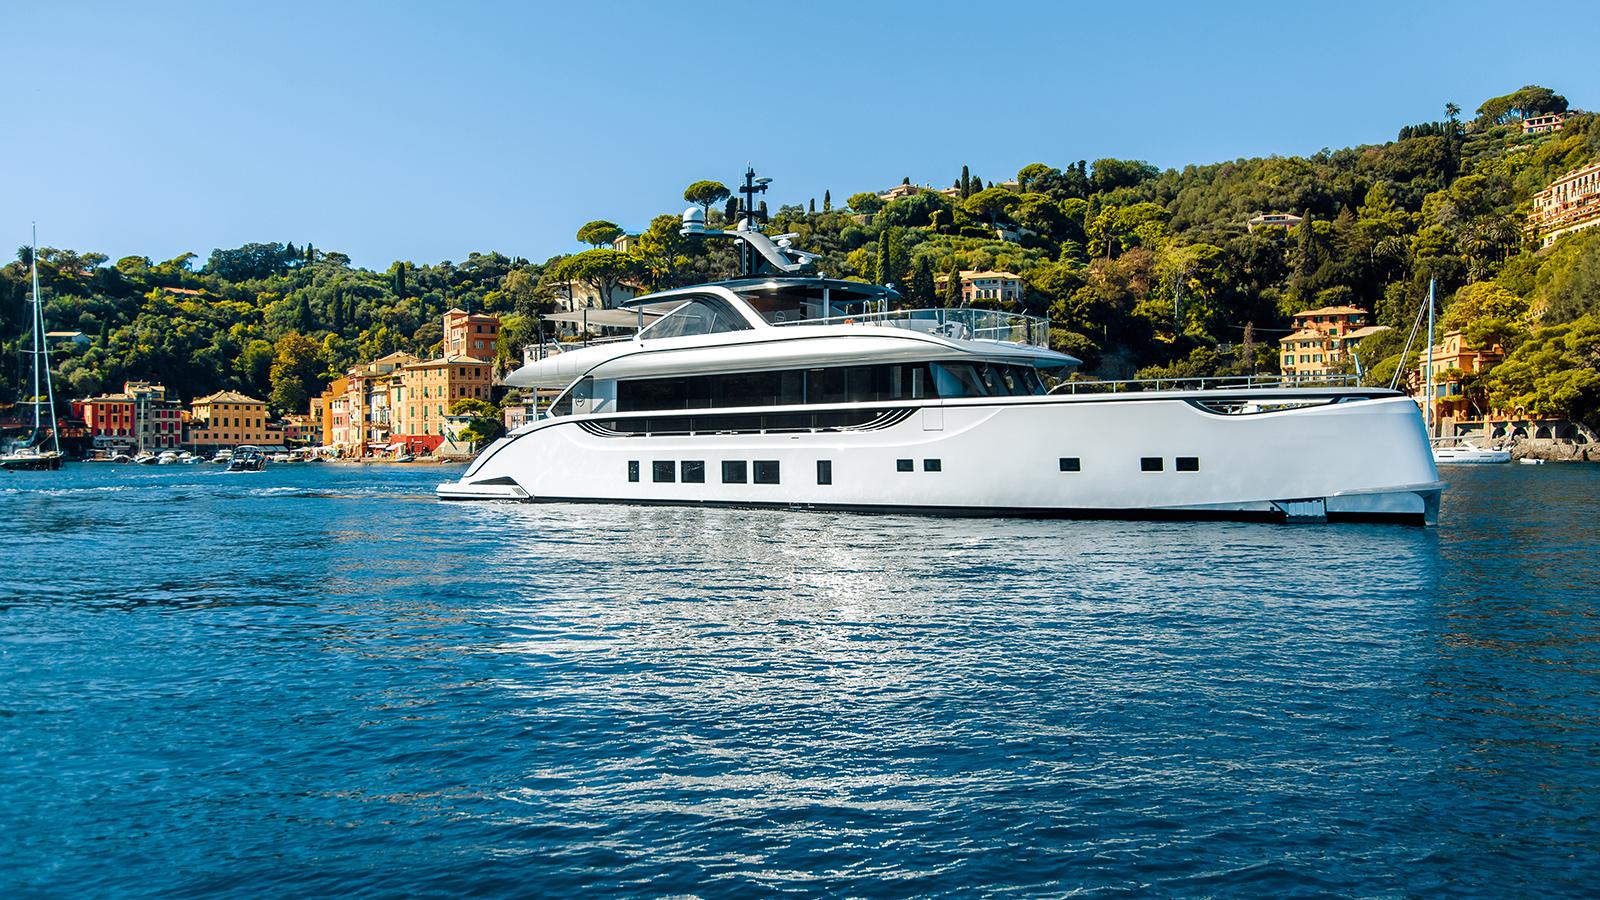 side-view-of-dynamiq-super-yacht-jetsetter